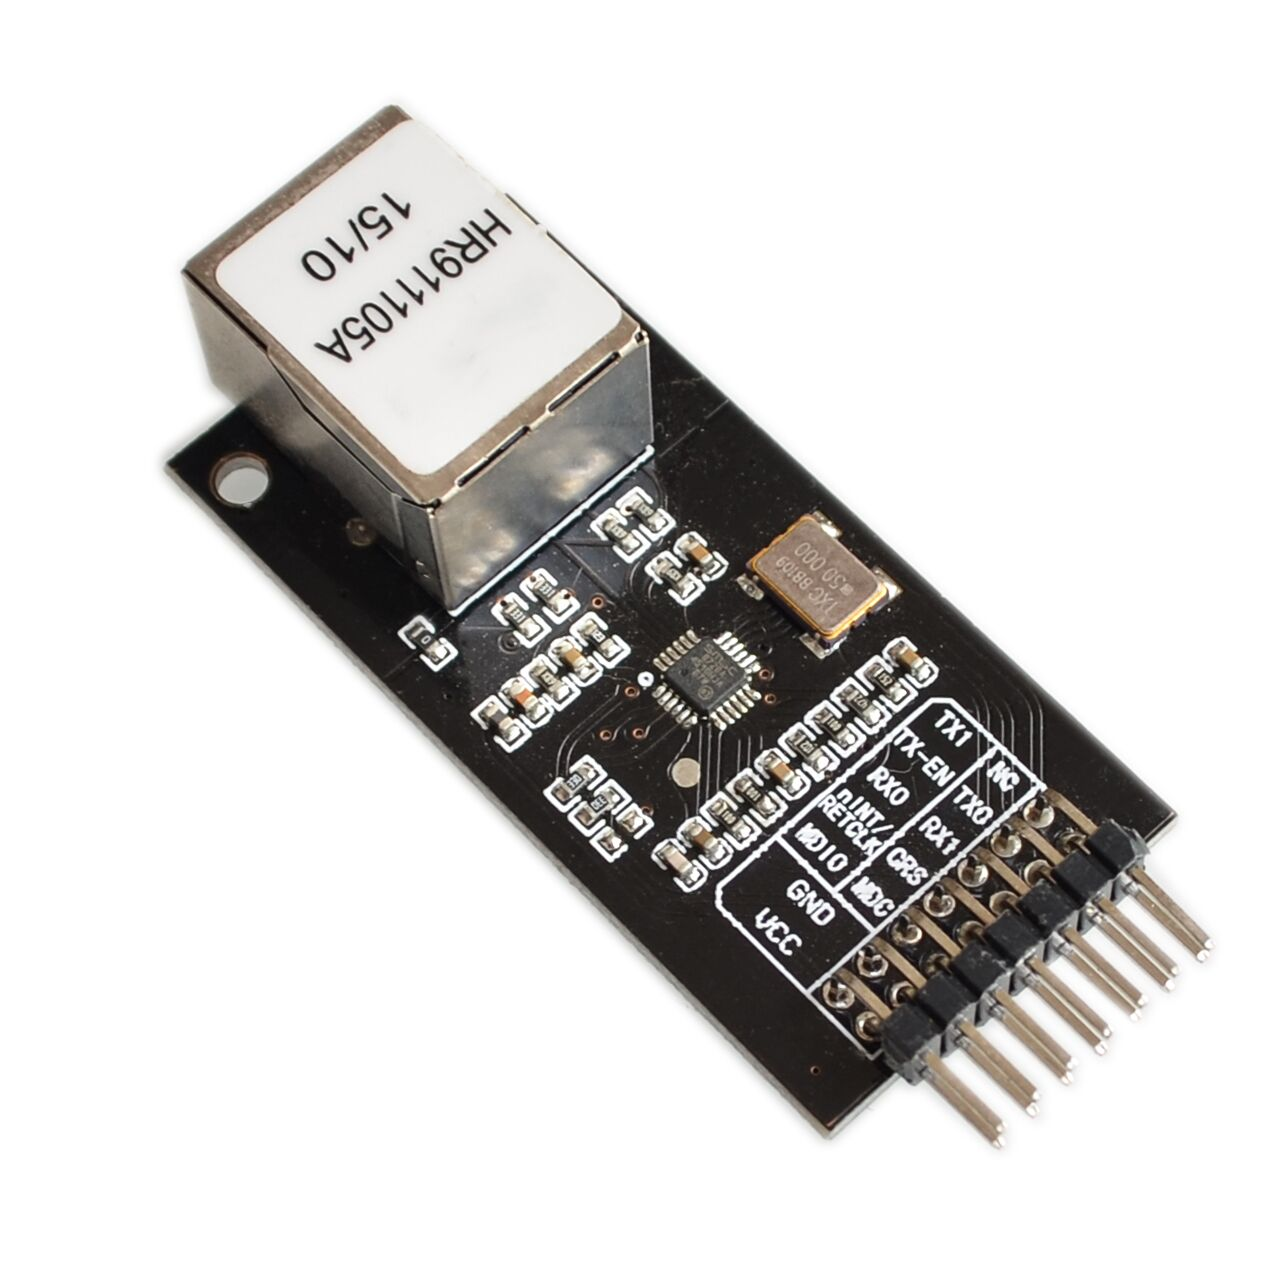 10pcs Lot Smart Electronics Lan8720 Module Network Ethernet 4v Pcb Circuit Board Battery Protection Croons 74v 18650 Transceiver Rmii Interface Development For Arduino